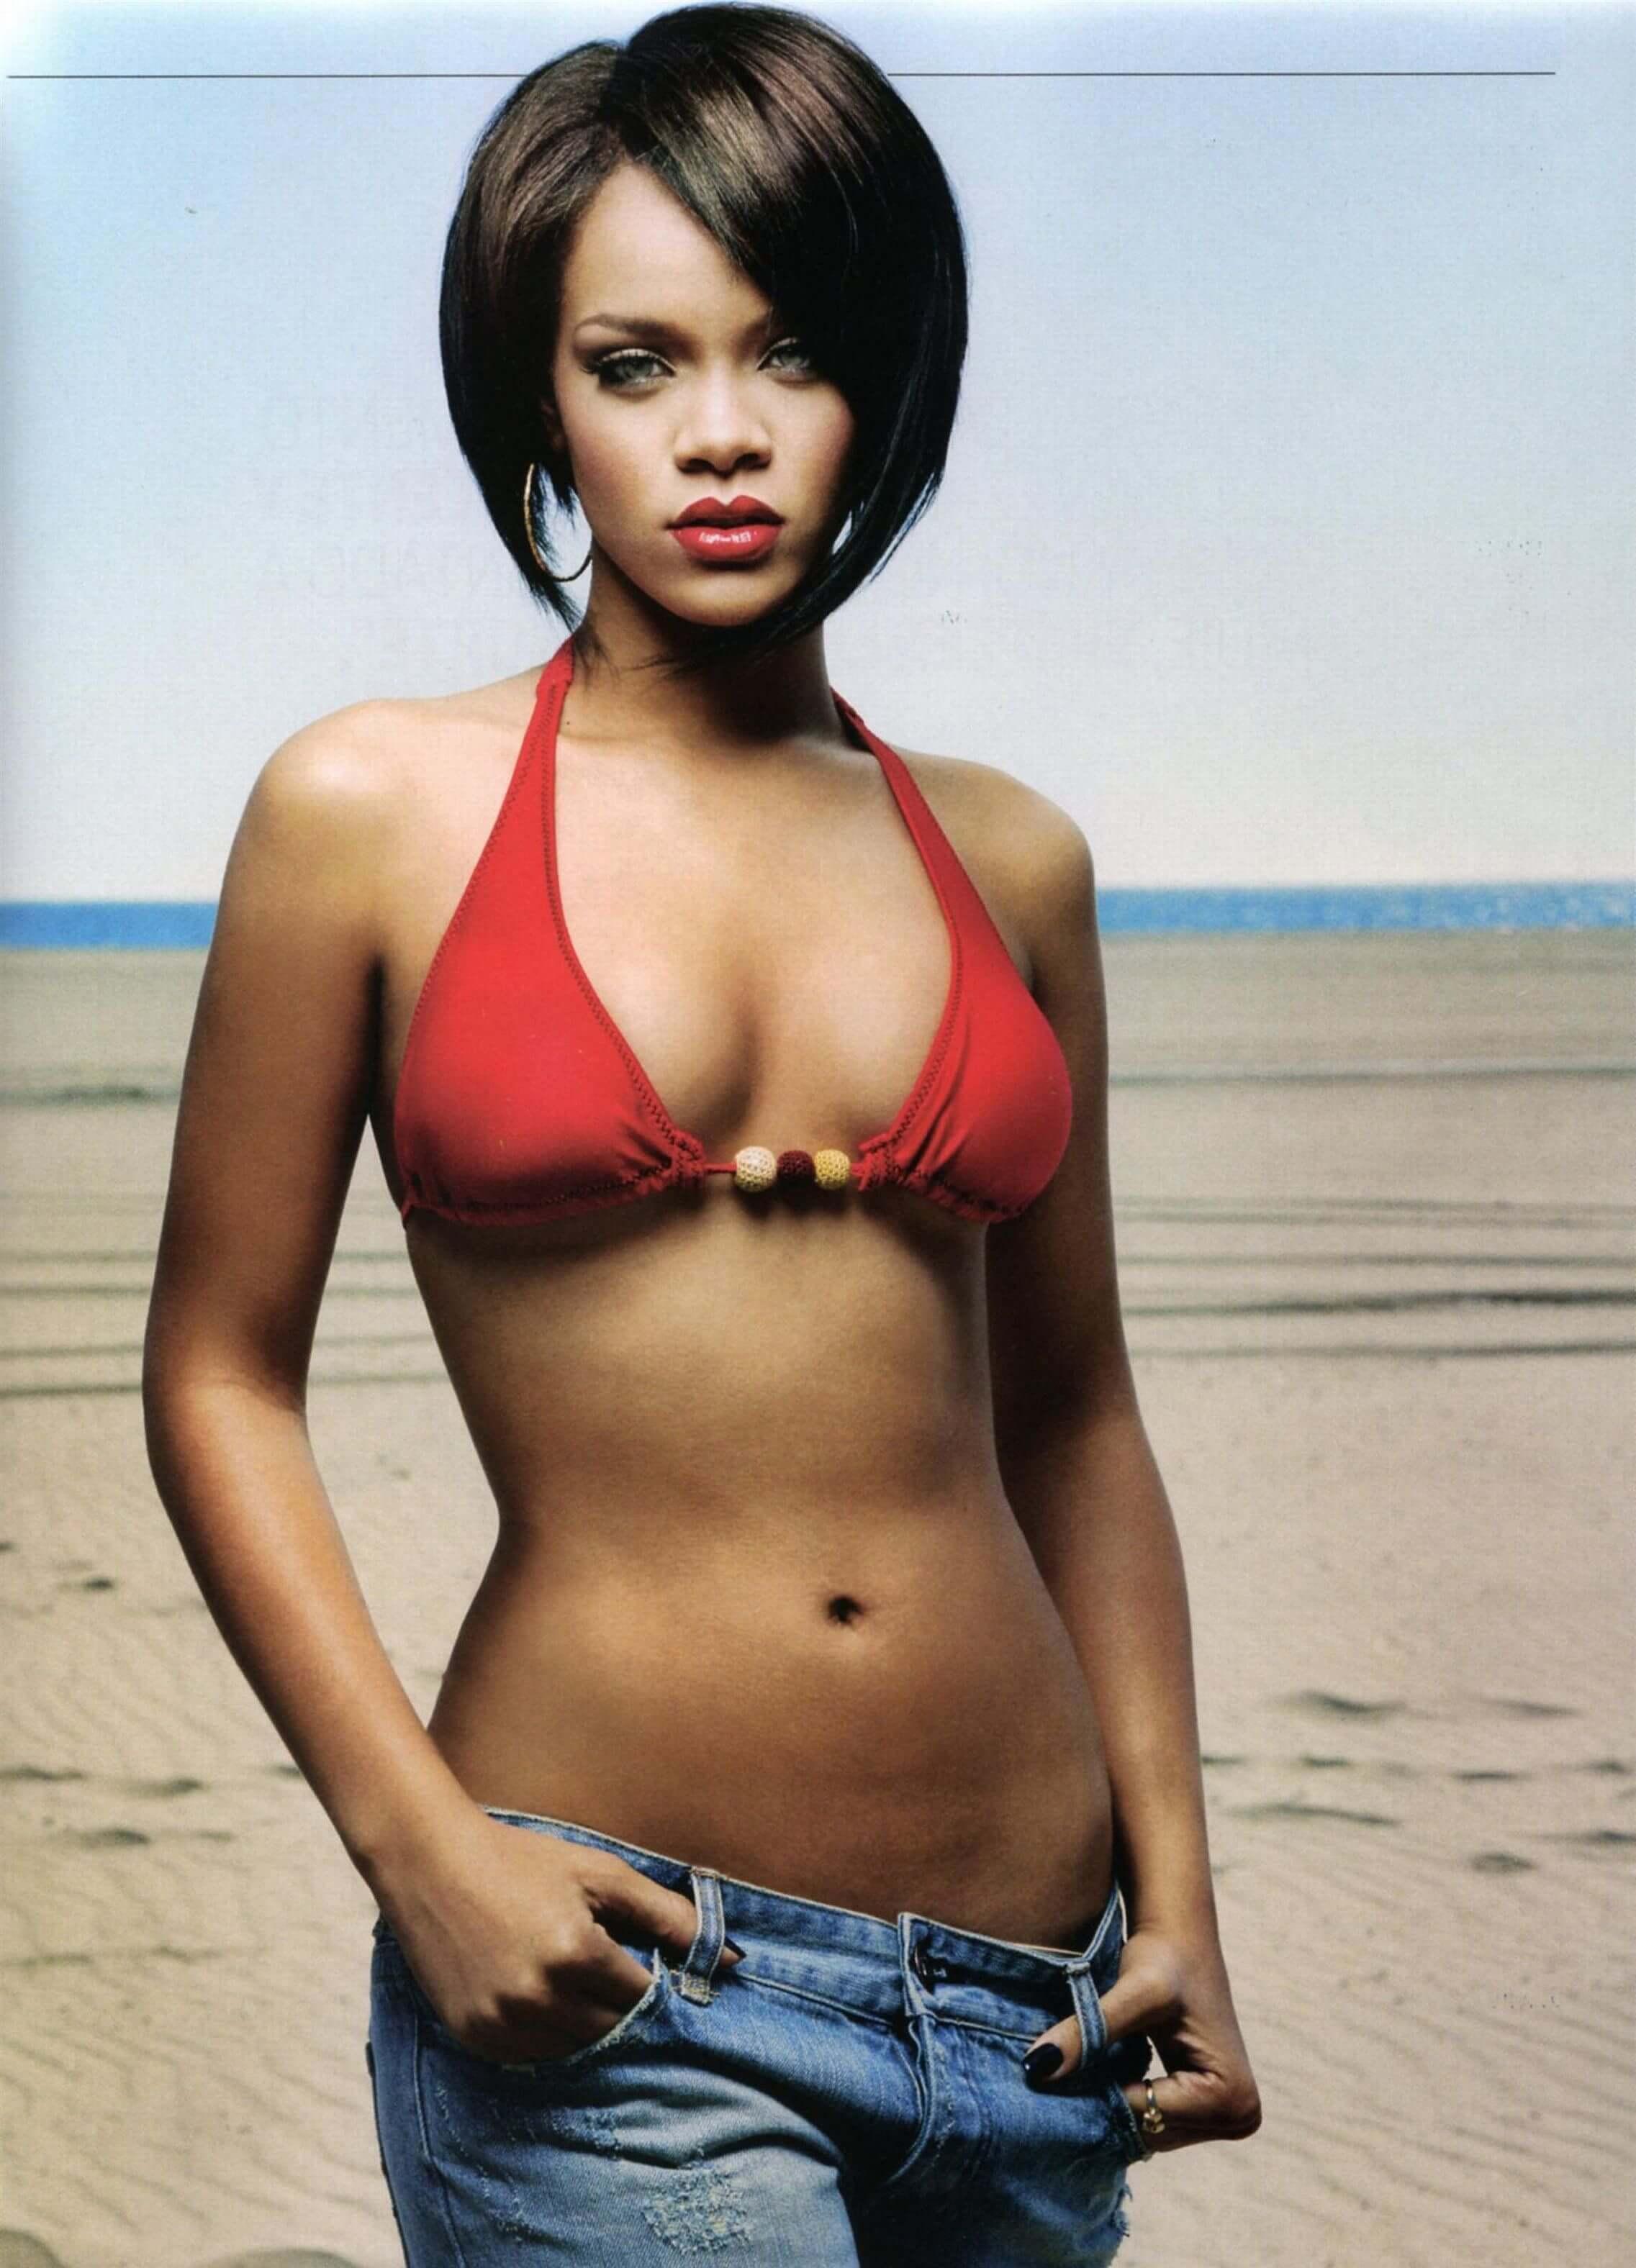 50 Hot And Sexy Rihanna Photos Around The Net - 12thBlog